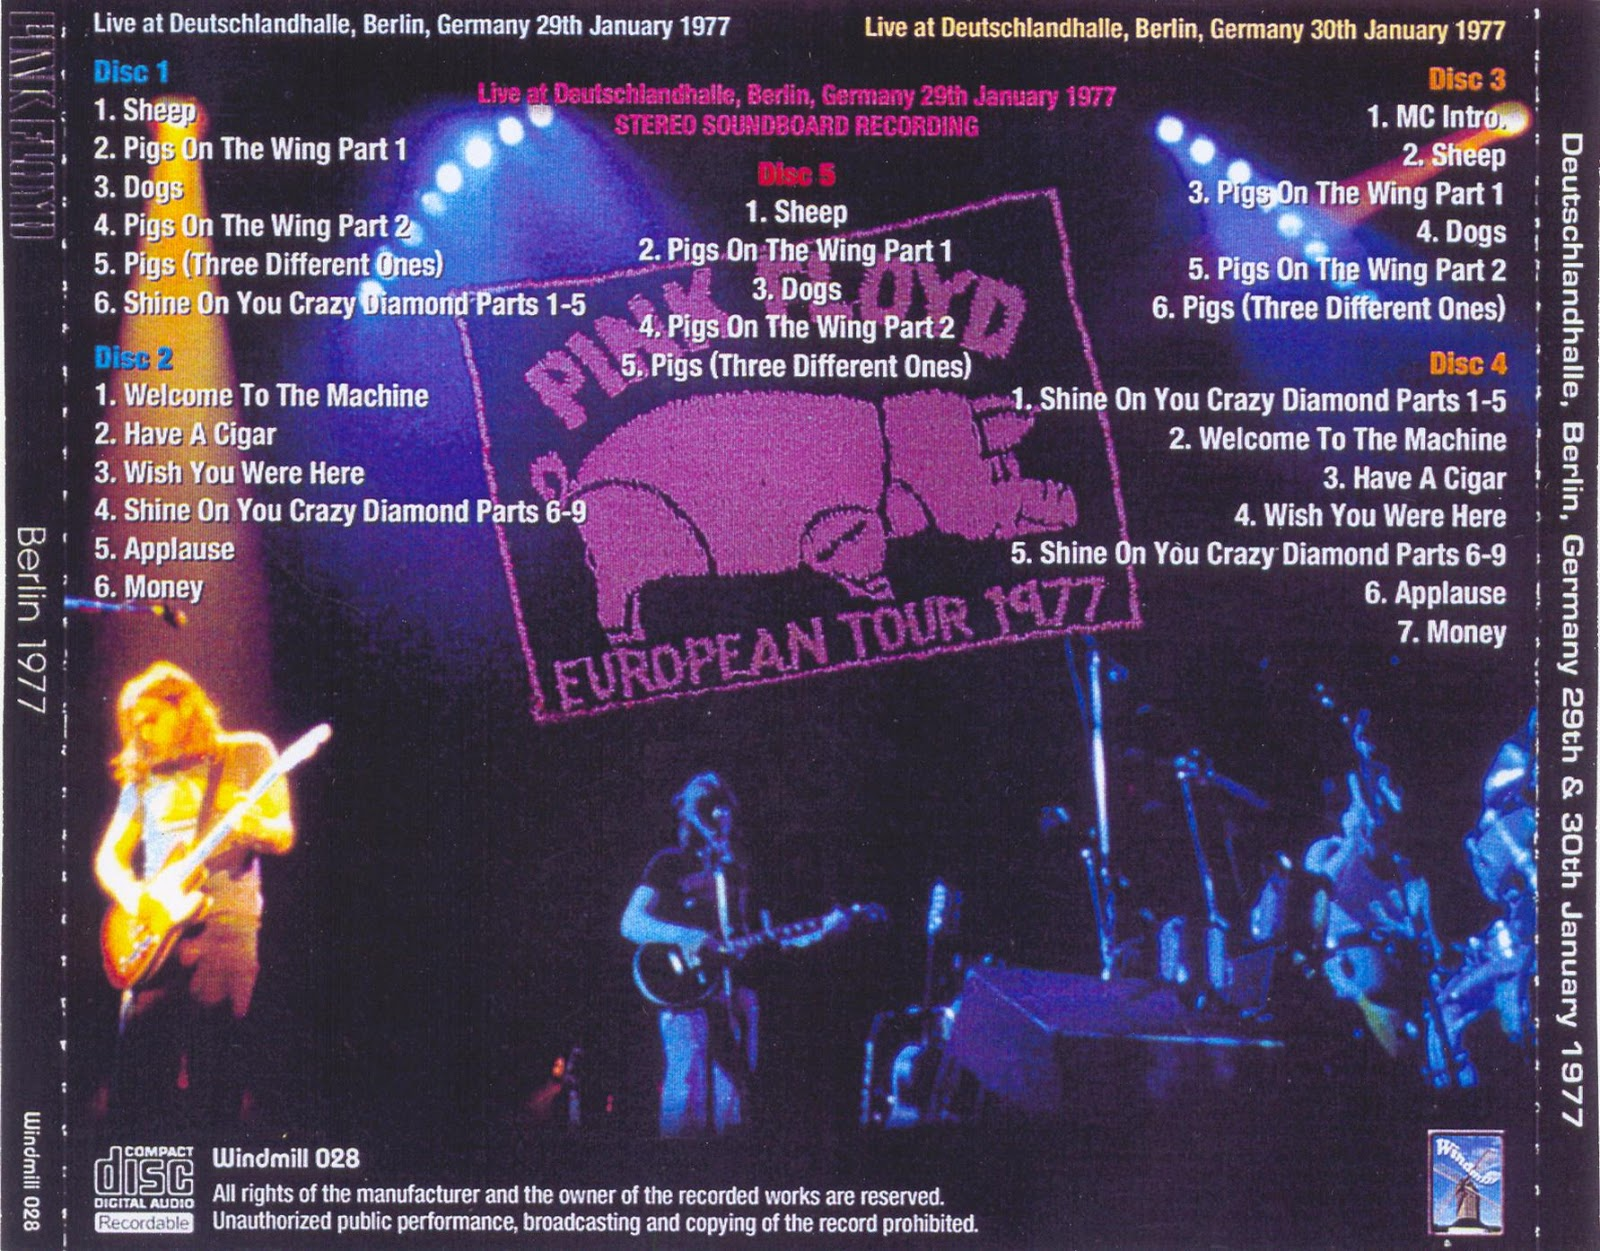 Reliquary Pink Floyd Berlin 1977 Windmill 028 5cd Box Set Ex